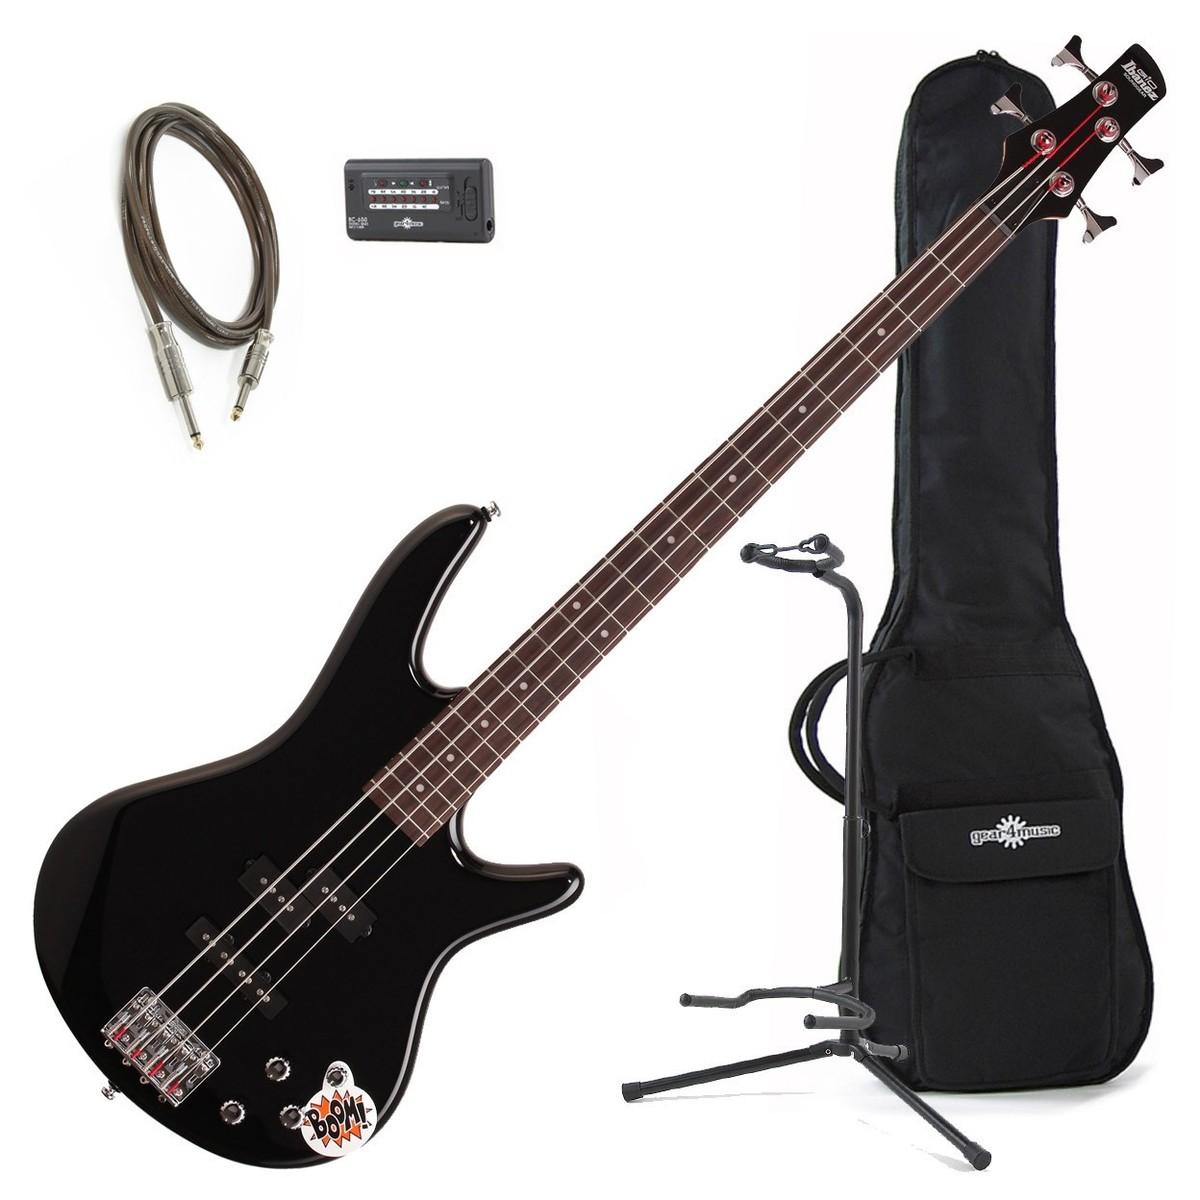 Ibanez Gsr200 Gio Bass Guitar Bundle Black At Gear4music